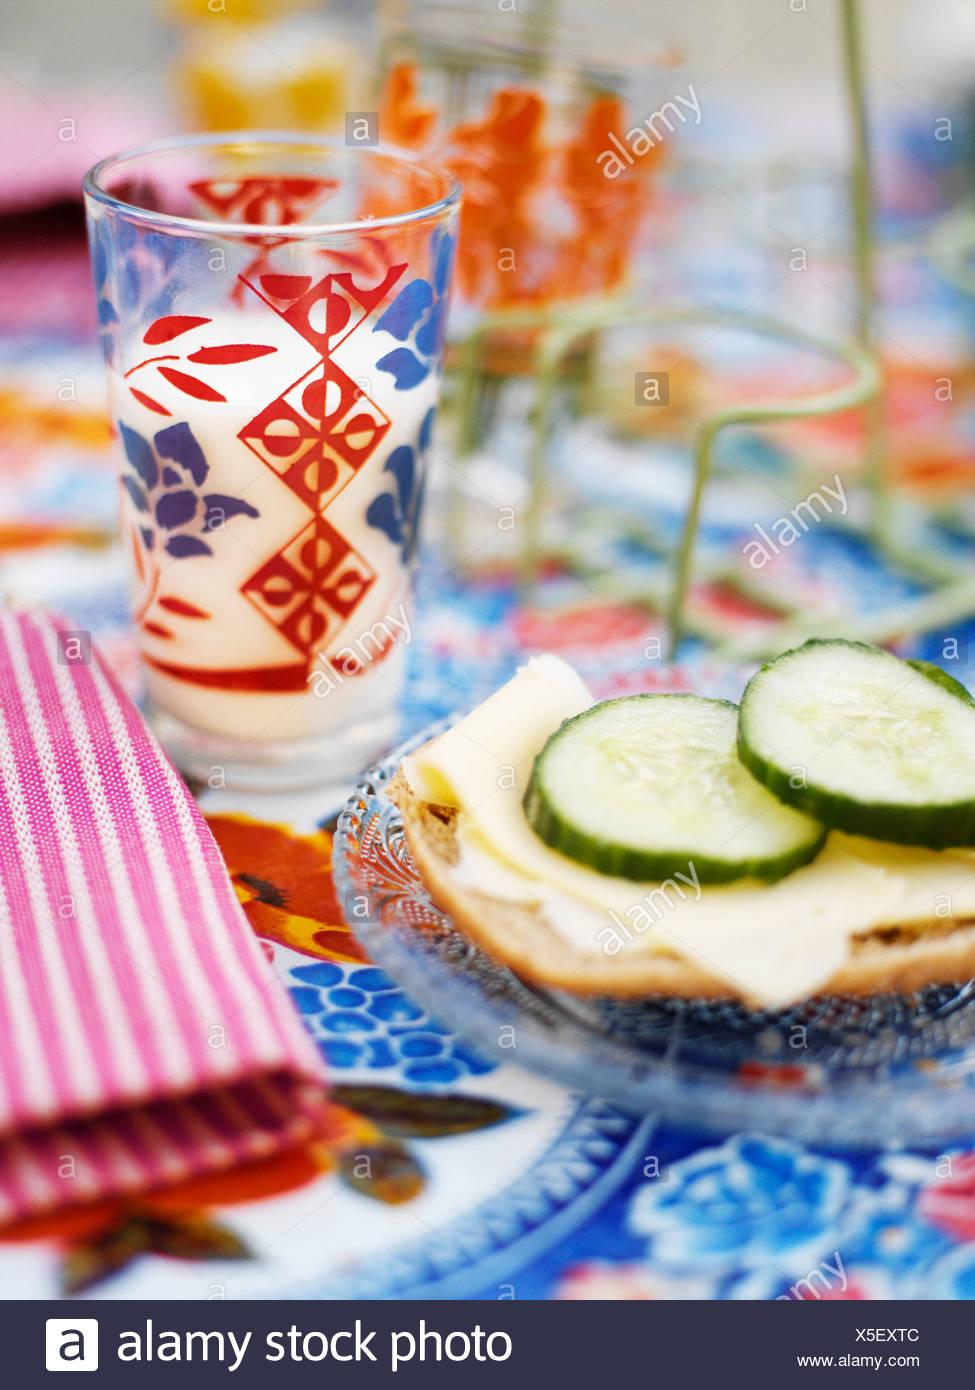 Sandwiche and a glas of milk. - Stock Image